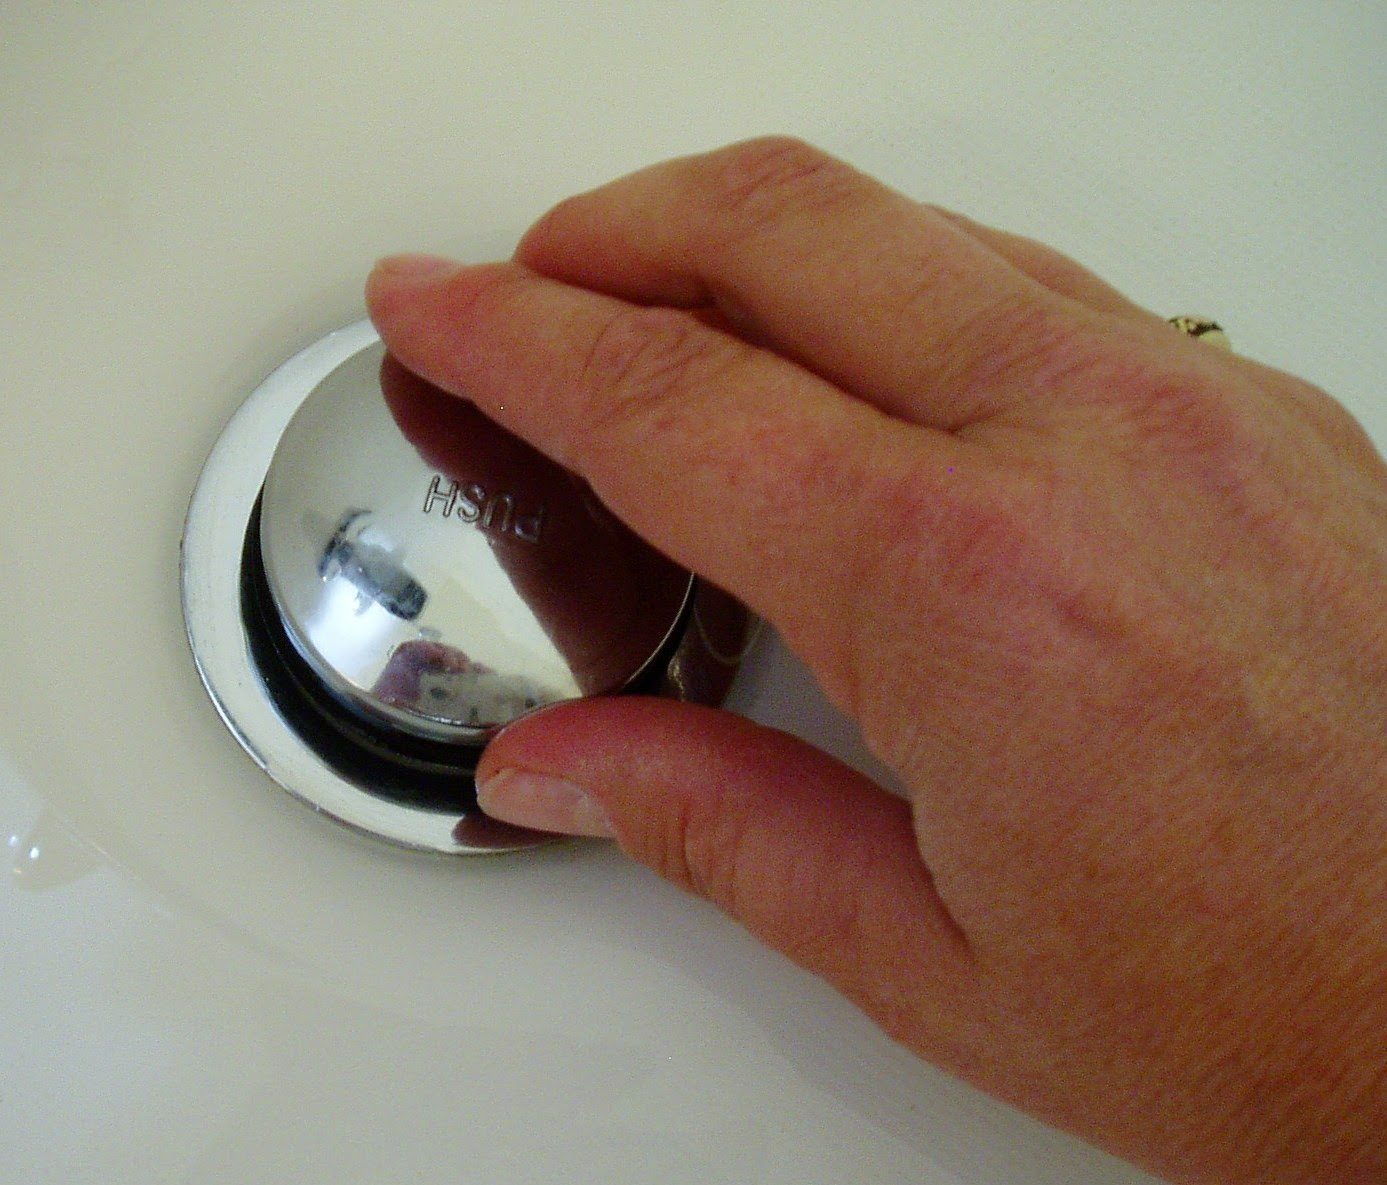 How To Clean Bathtub Drain Clogged With Hair Home